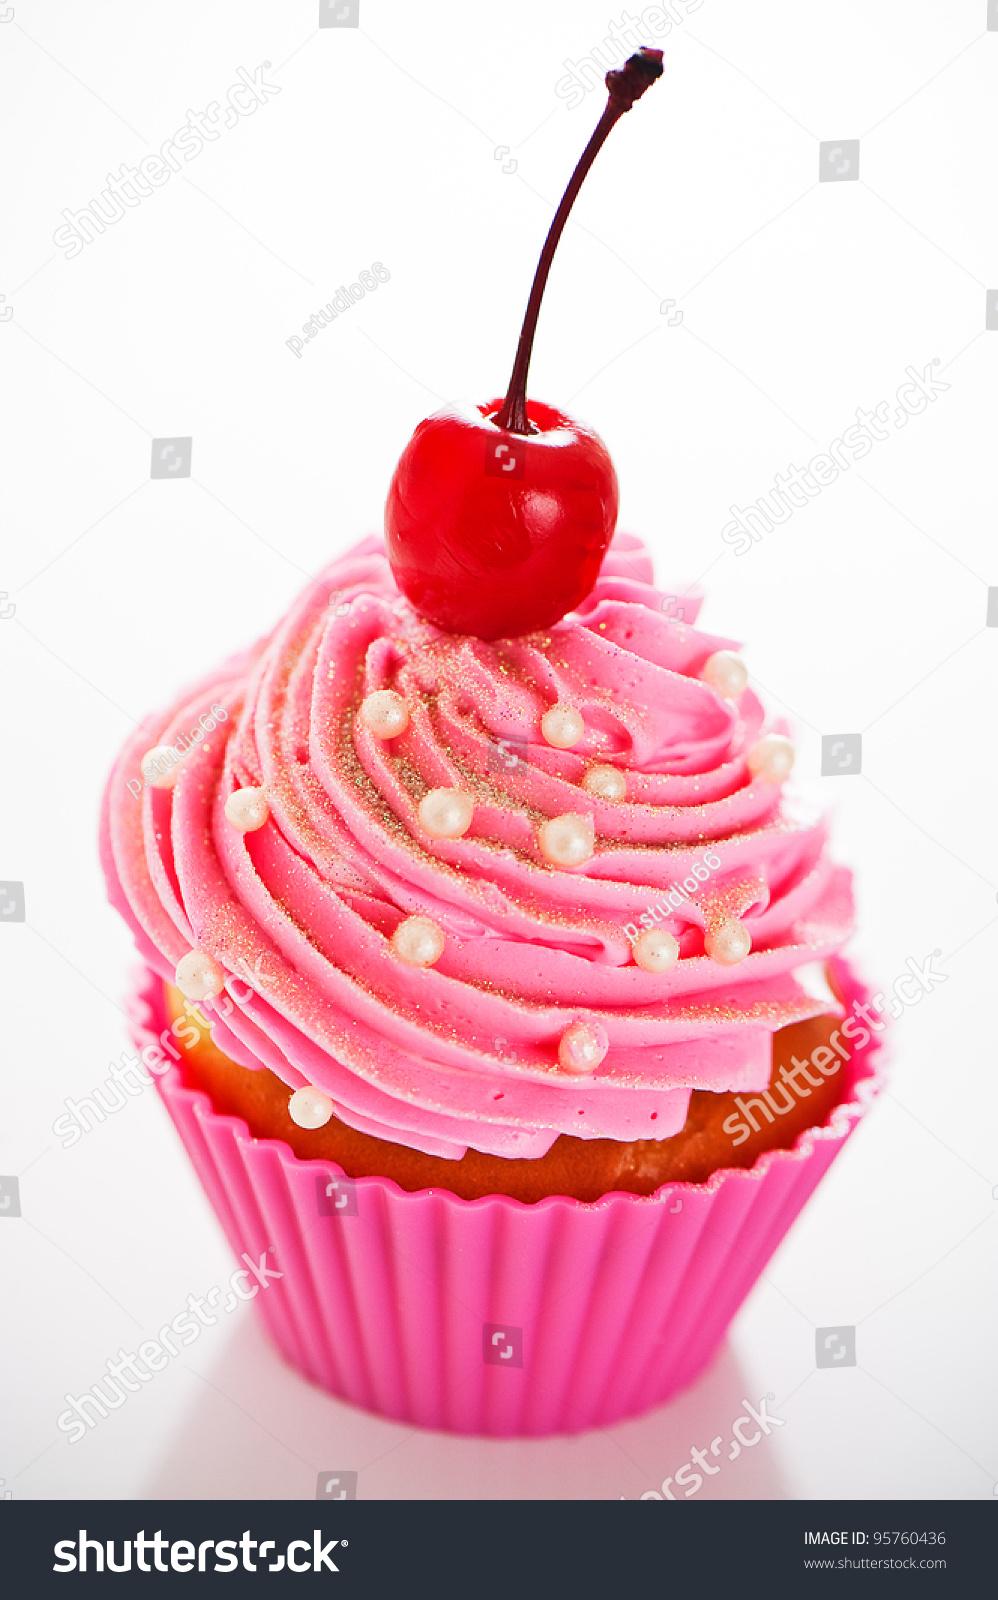 Cupcake pink baking cups pink cream stock photo 95760436 shutterstock - Creme decoration cupcake ...